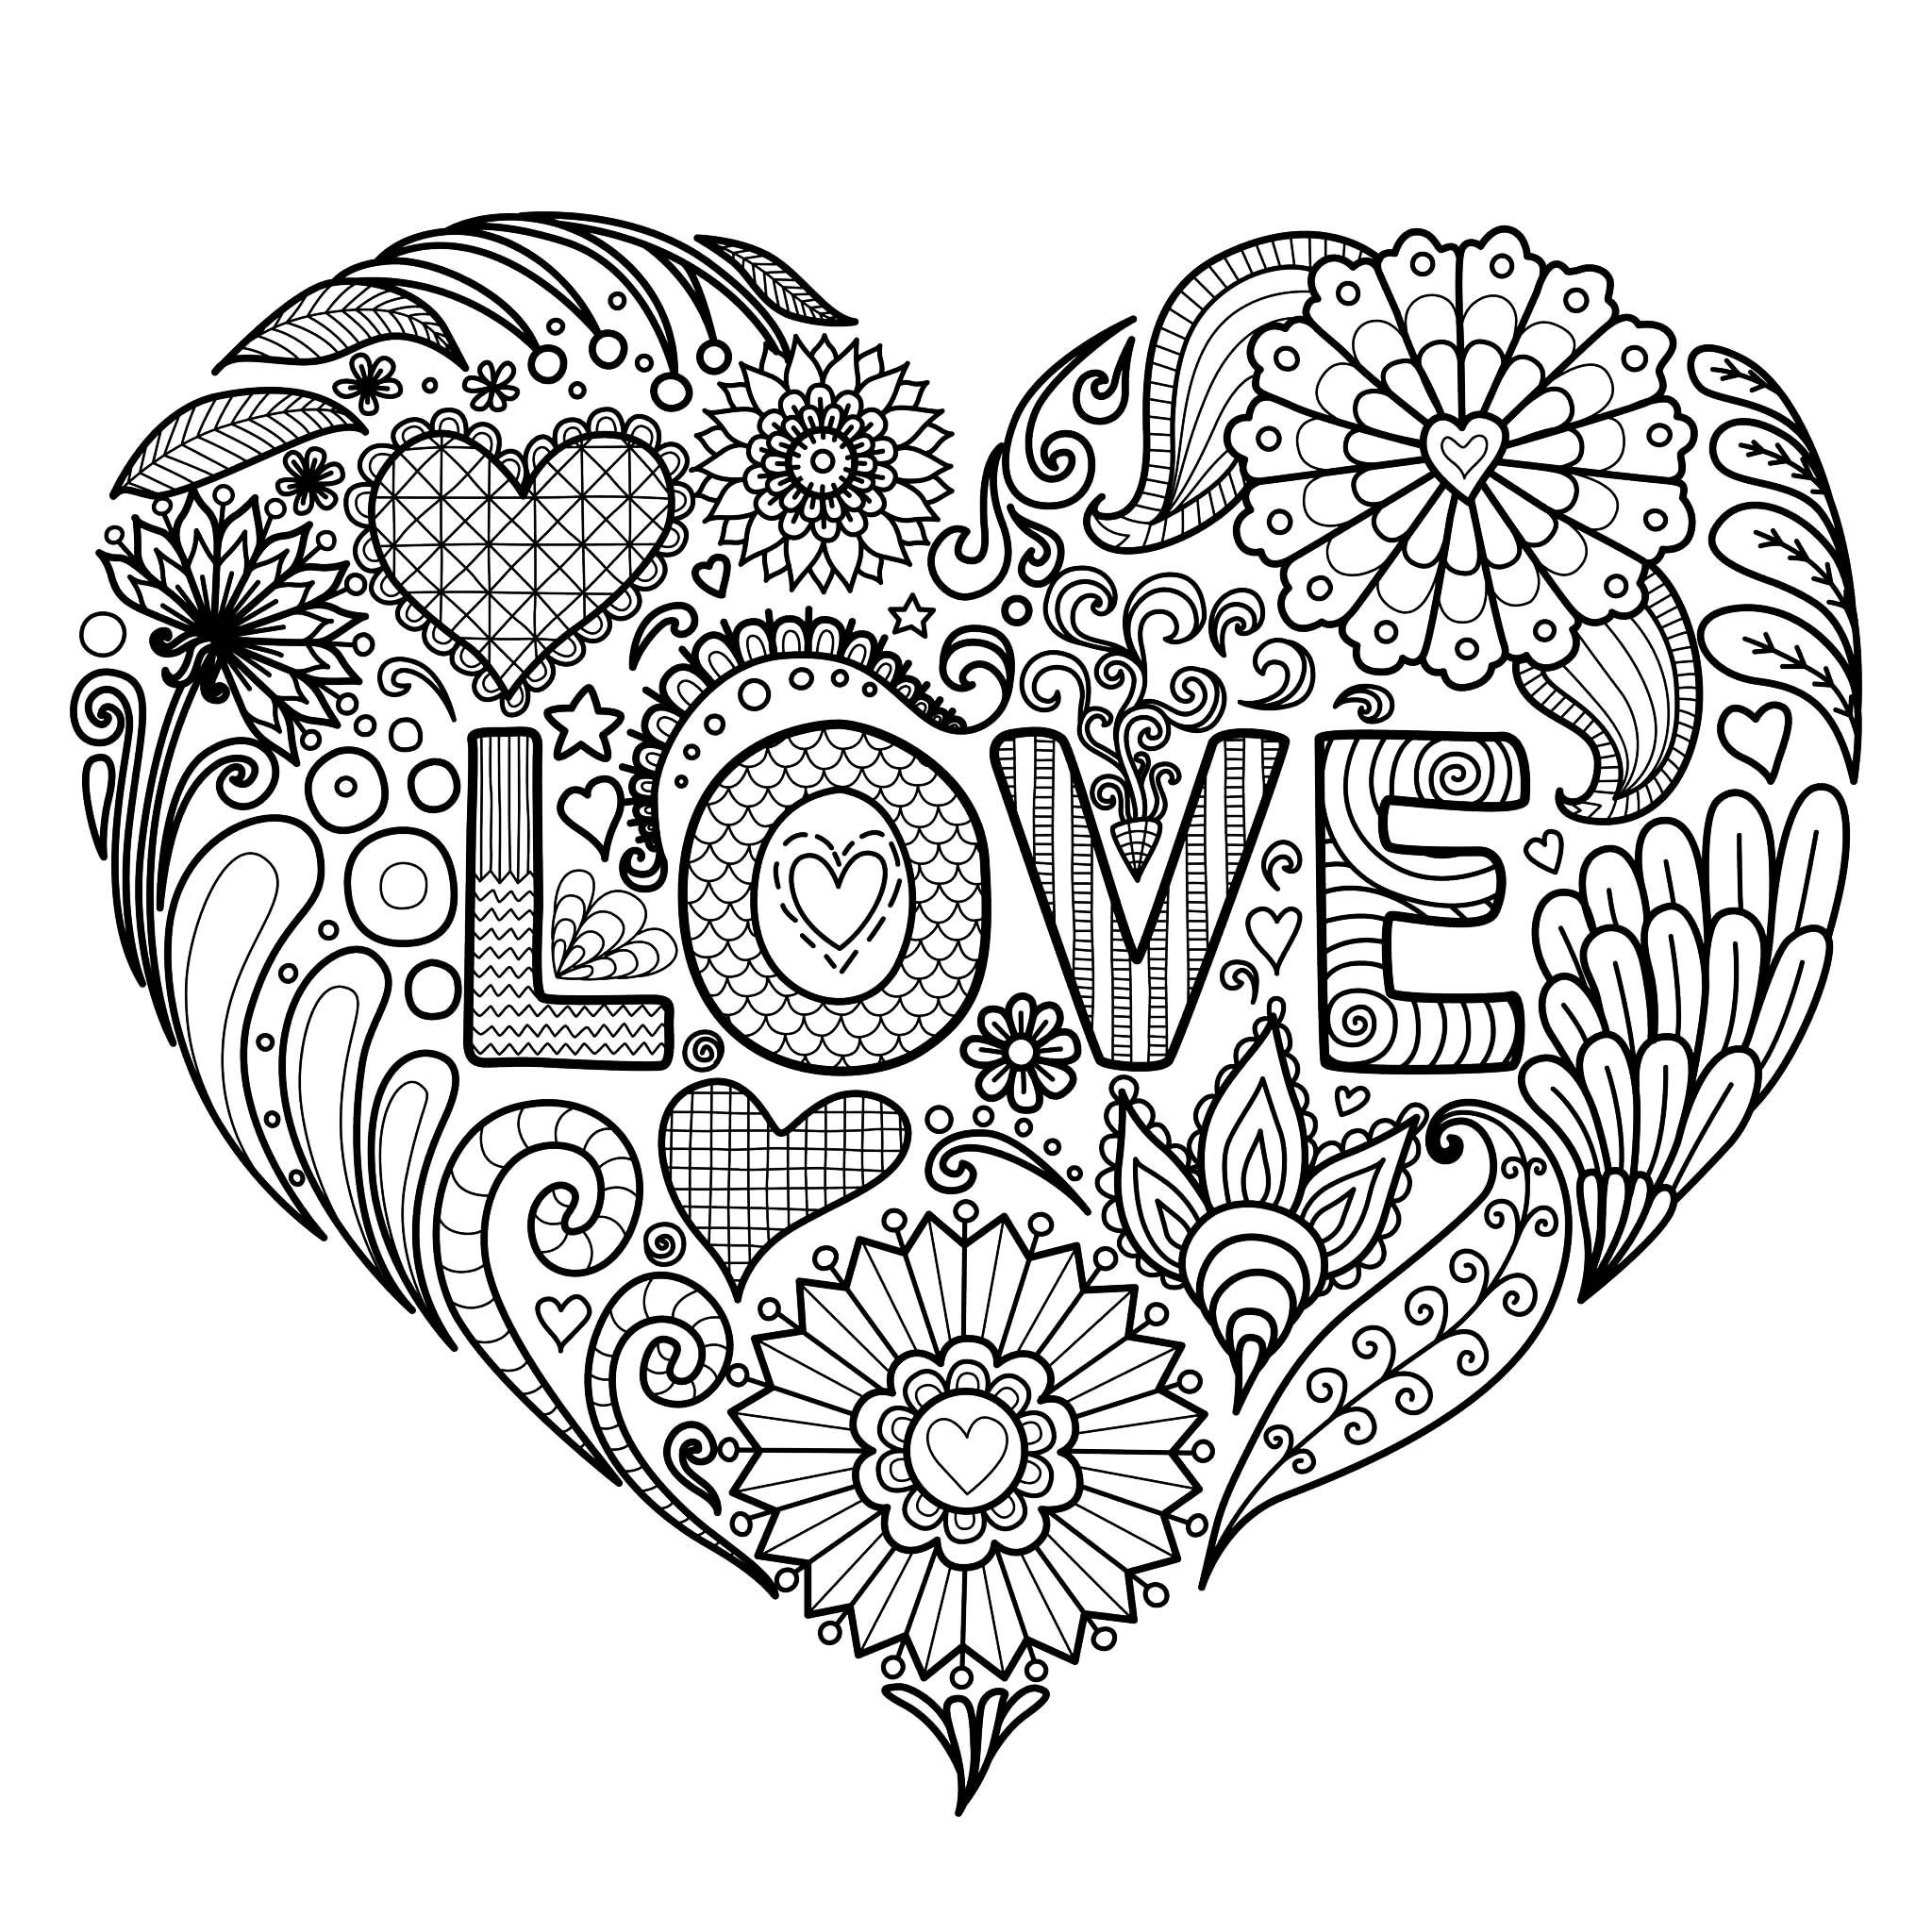 Colorear para Adultos : Día De San Valentín - 2